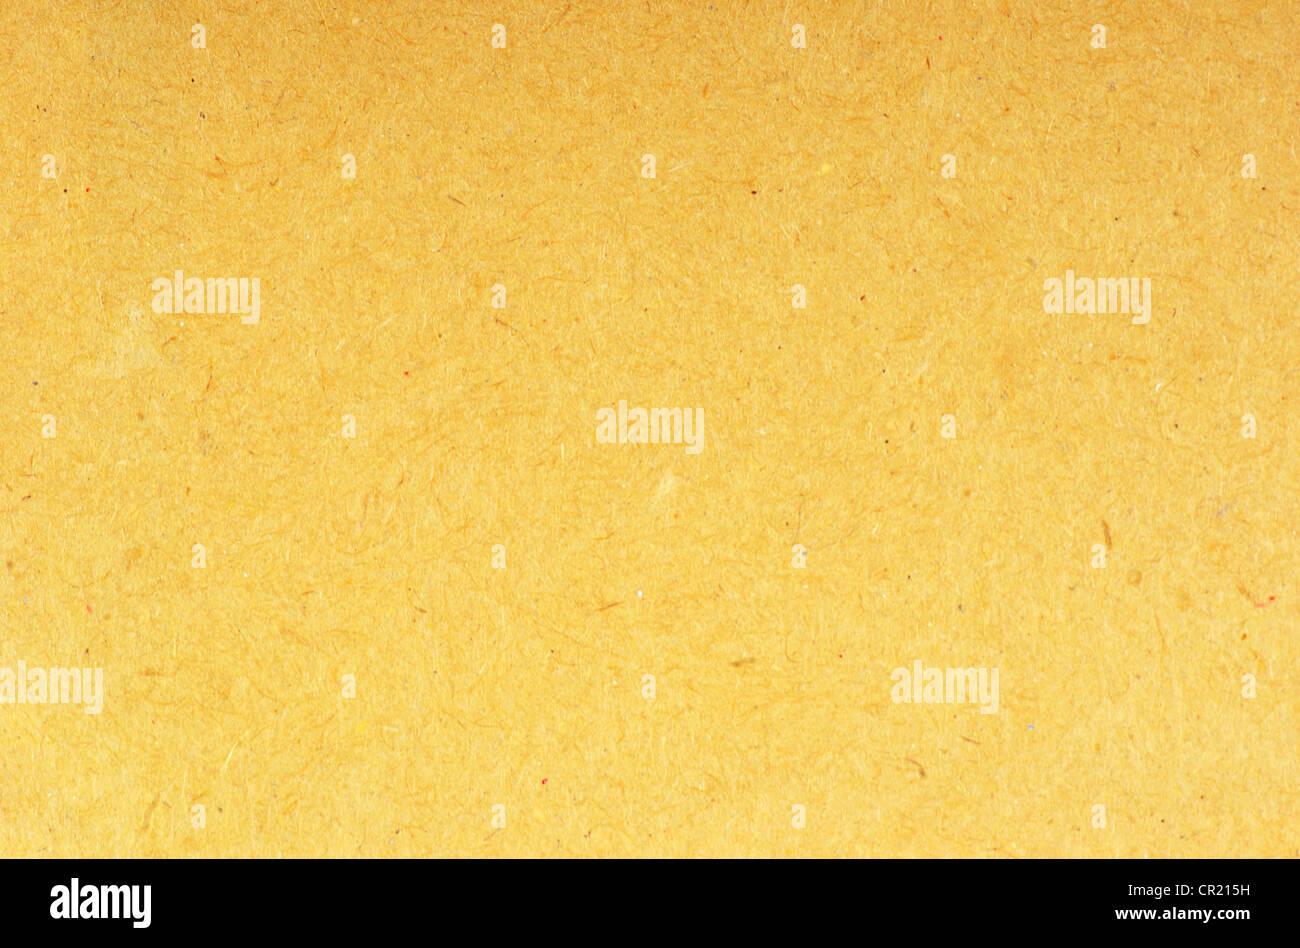 Handmade paper texture - Stock Image